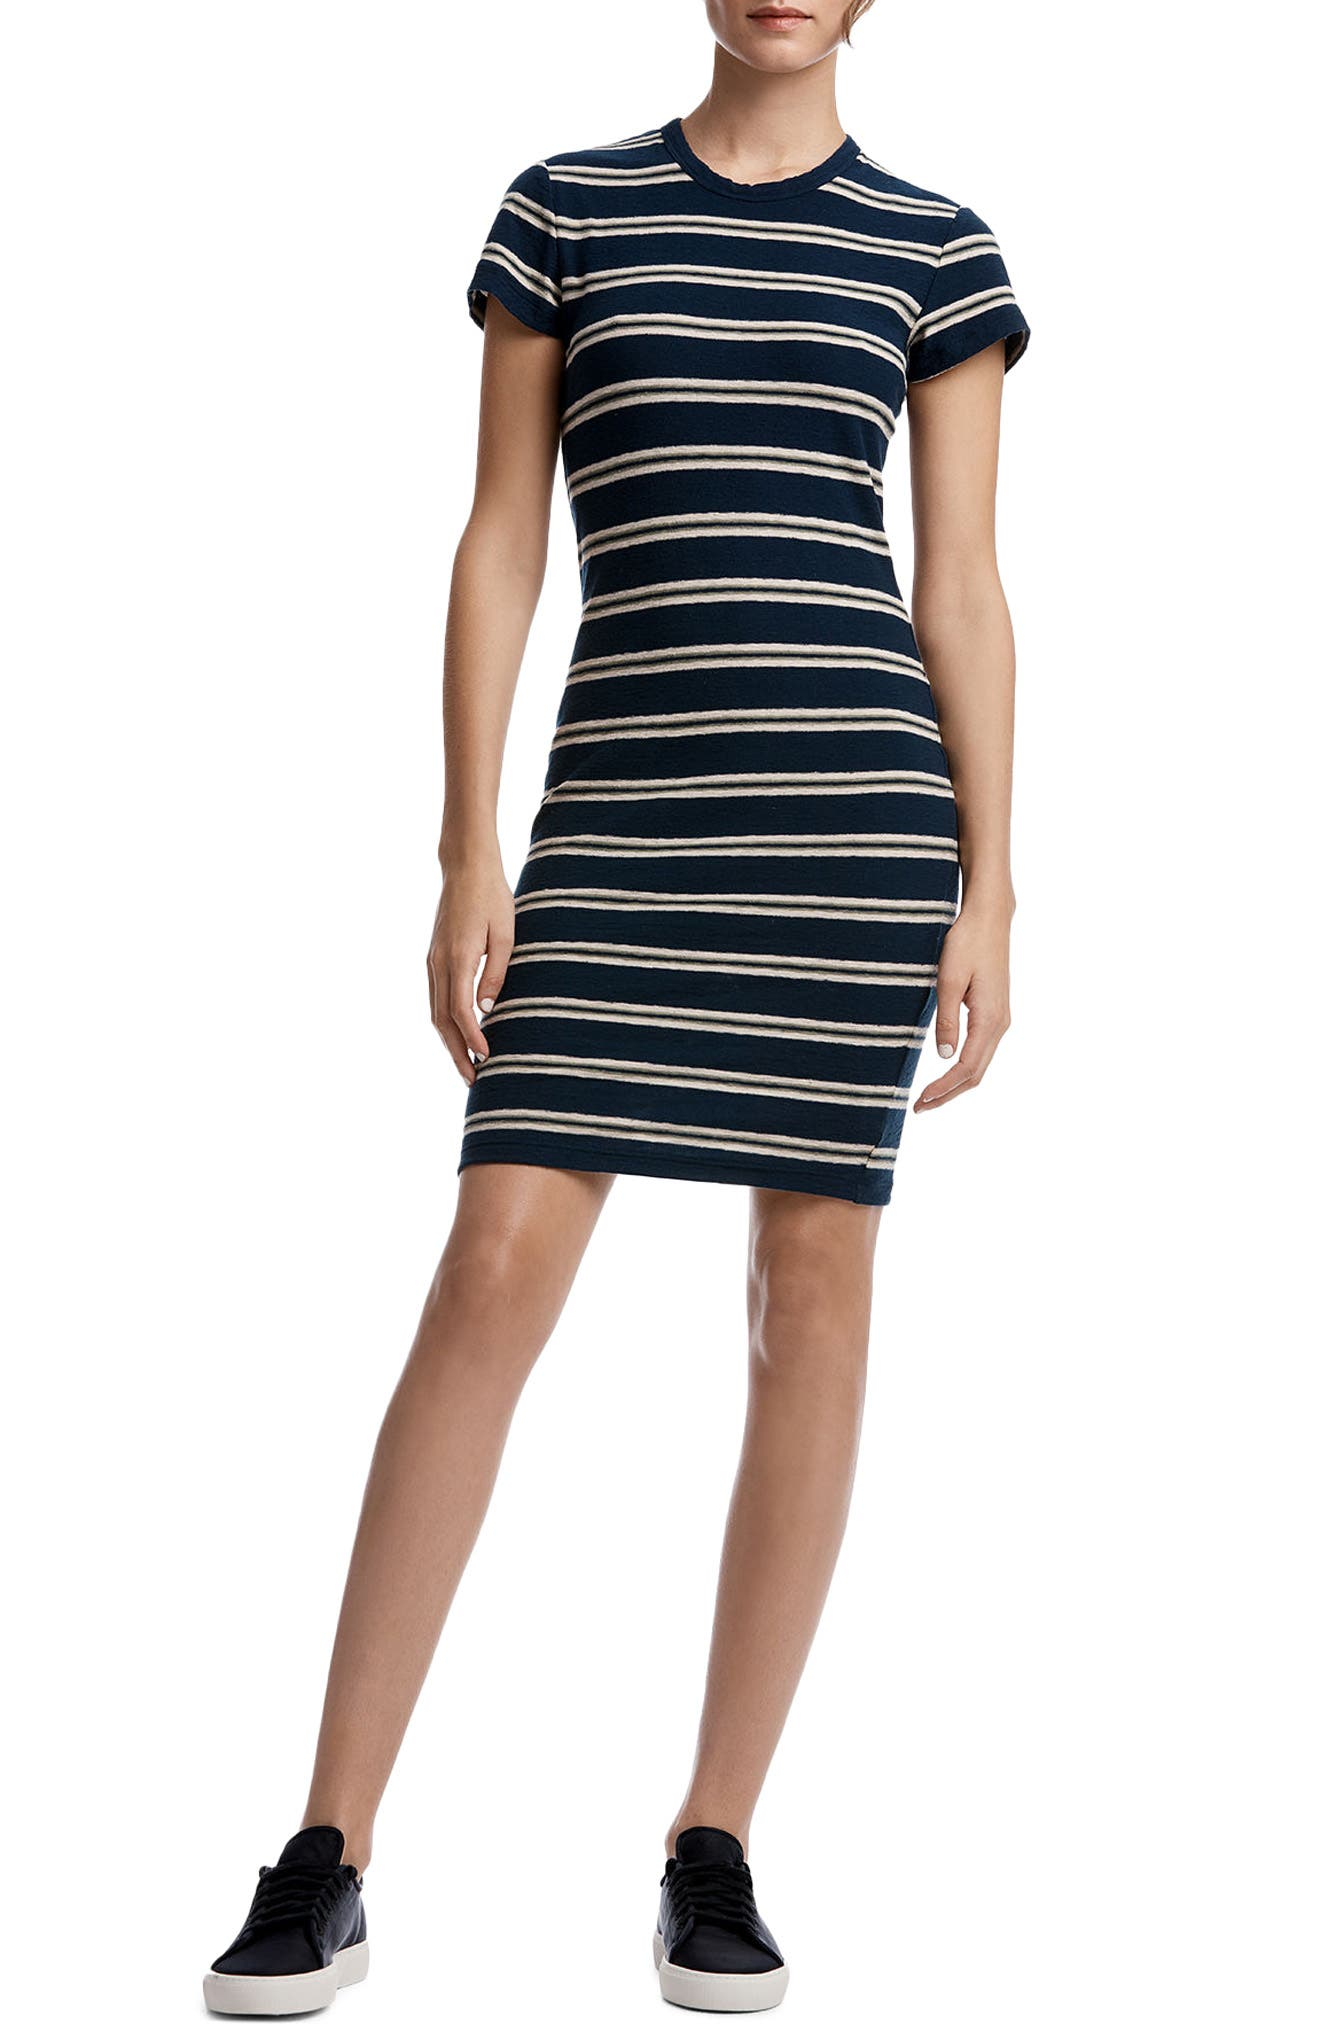 James Perse Vintage Stripe T-Shirt Dress